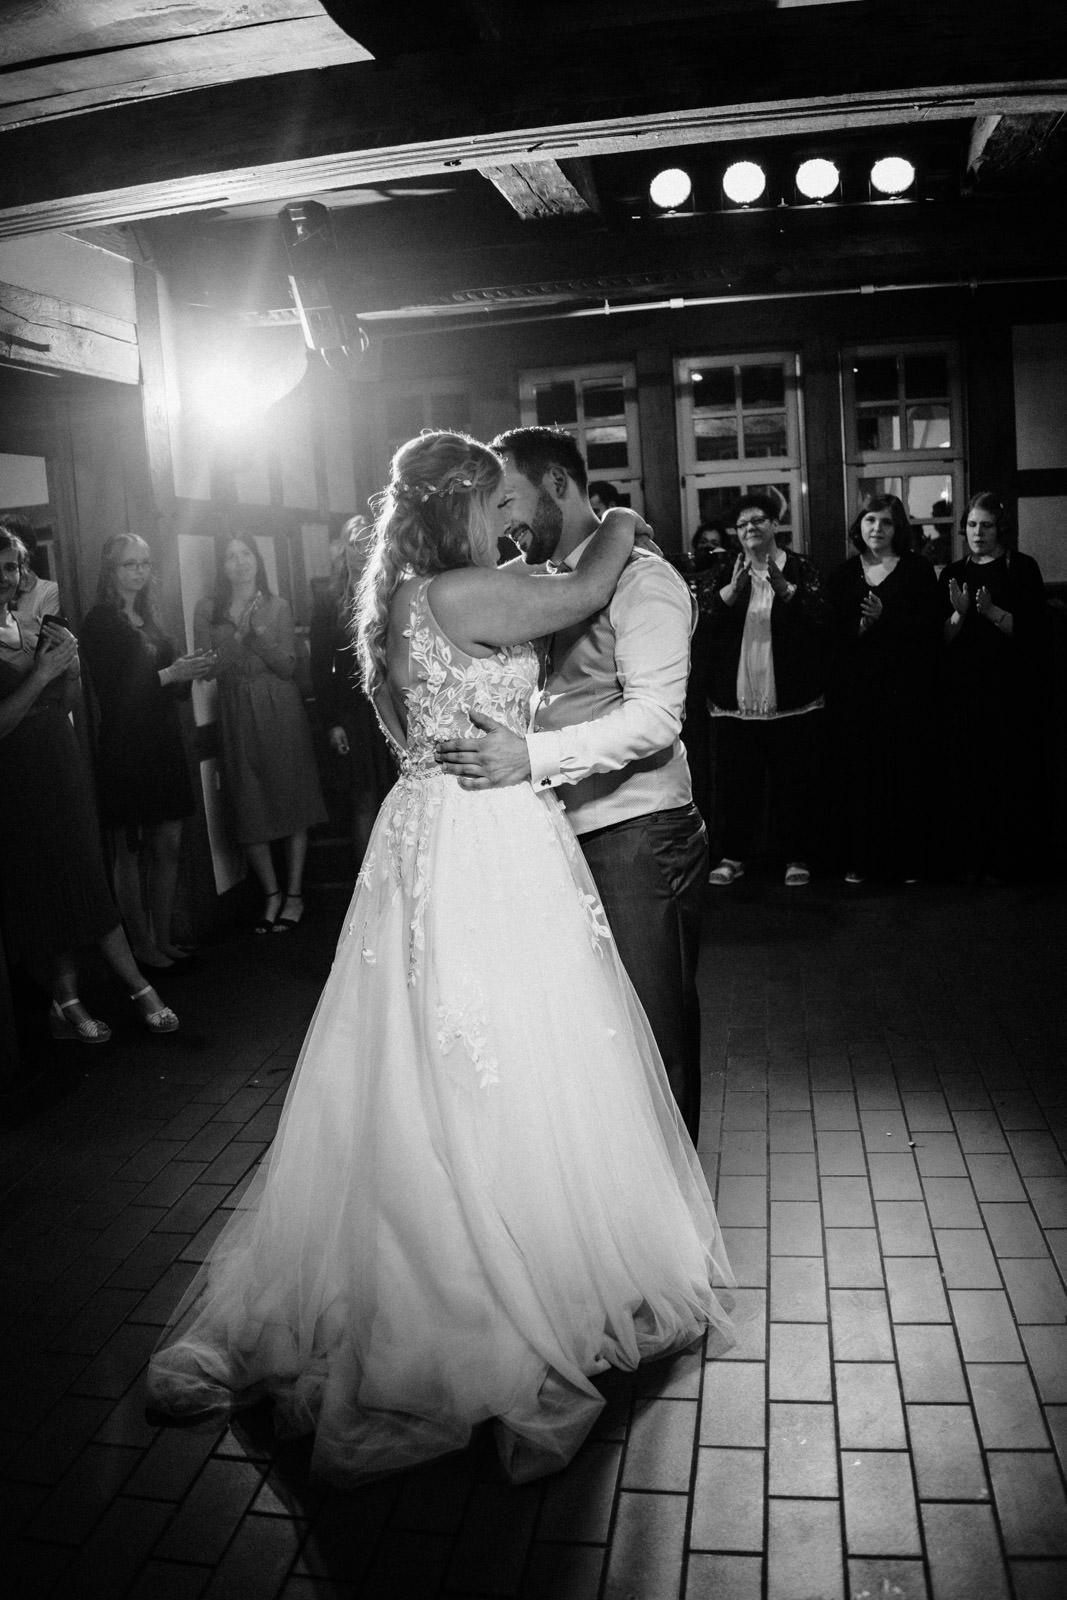 Hochzeitsfotograf-bielefeld-waterbör